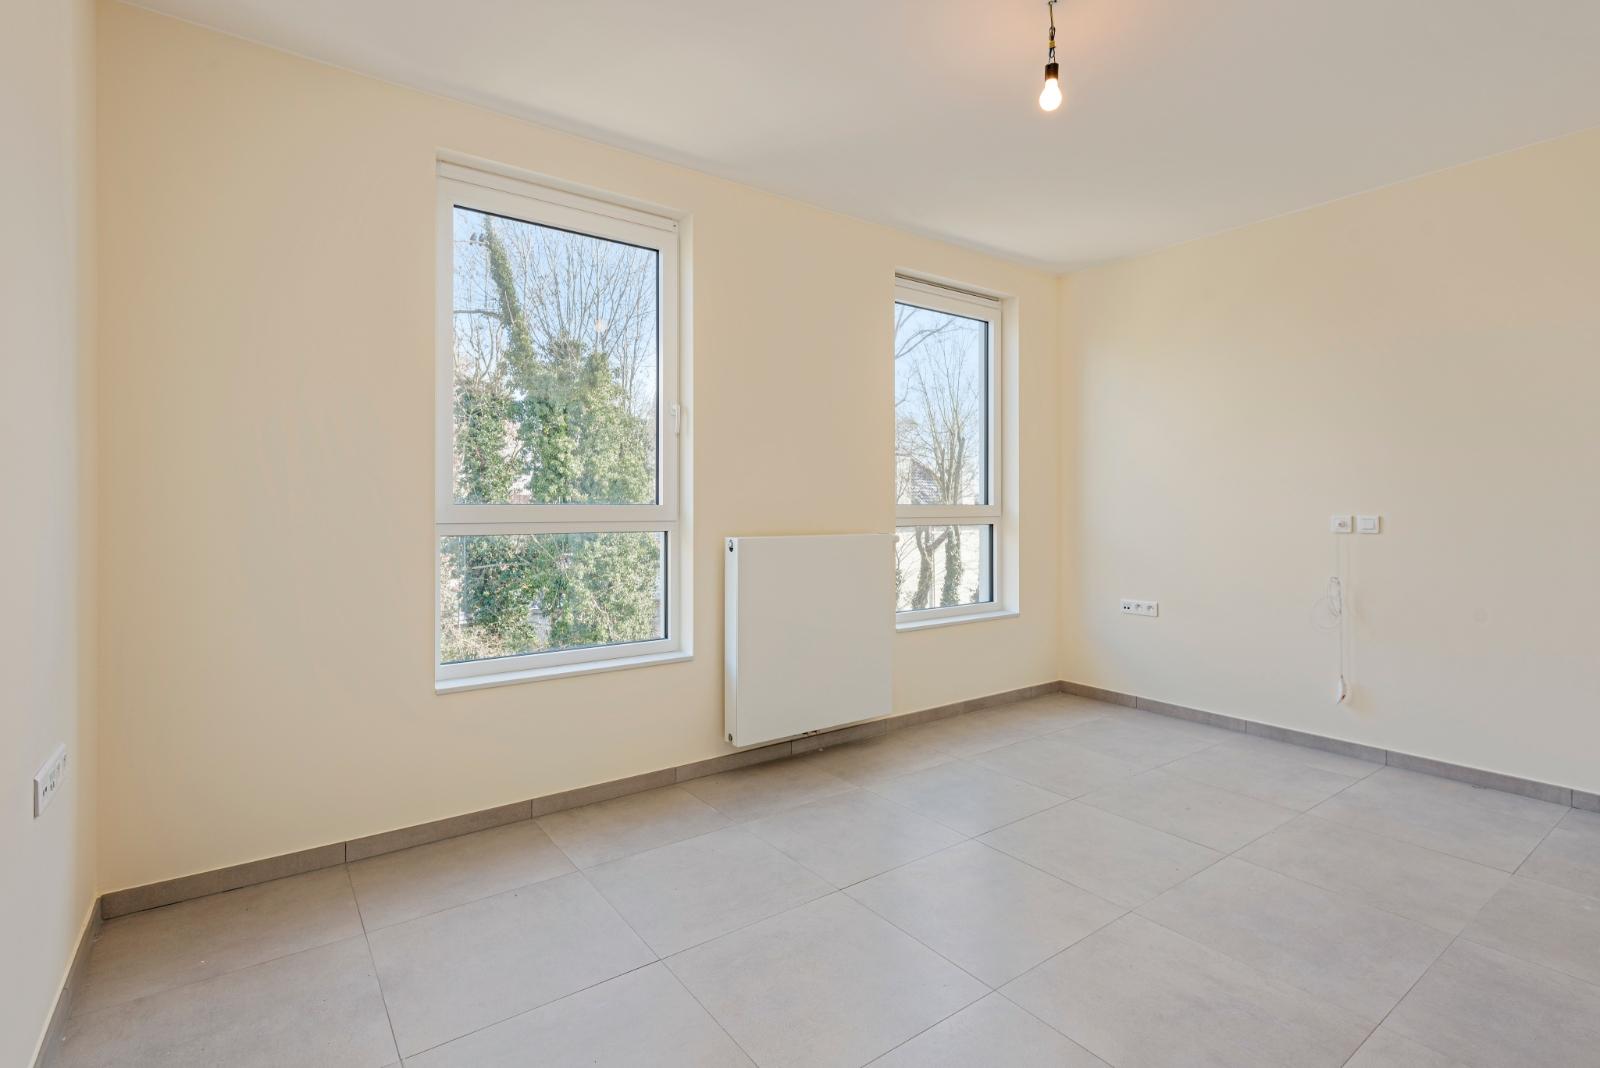 Laatste appartement / assistentieflat te Vlamertinge te koop - 10